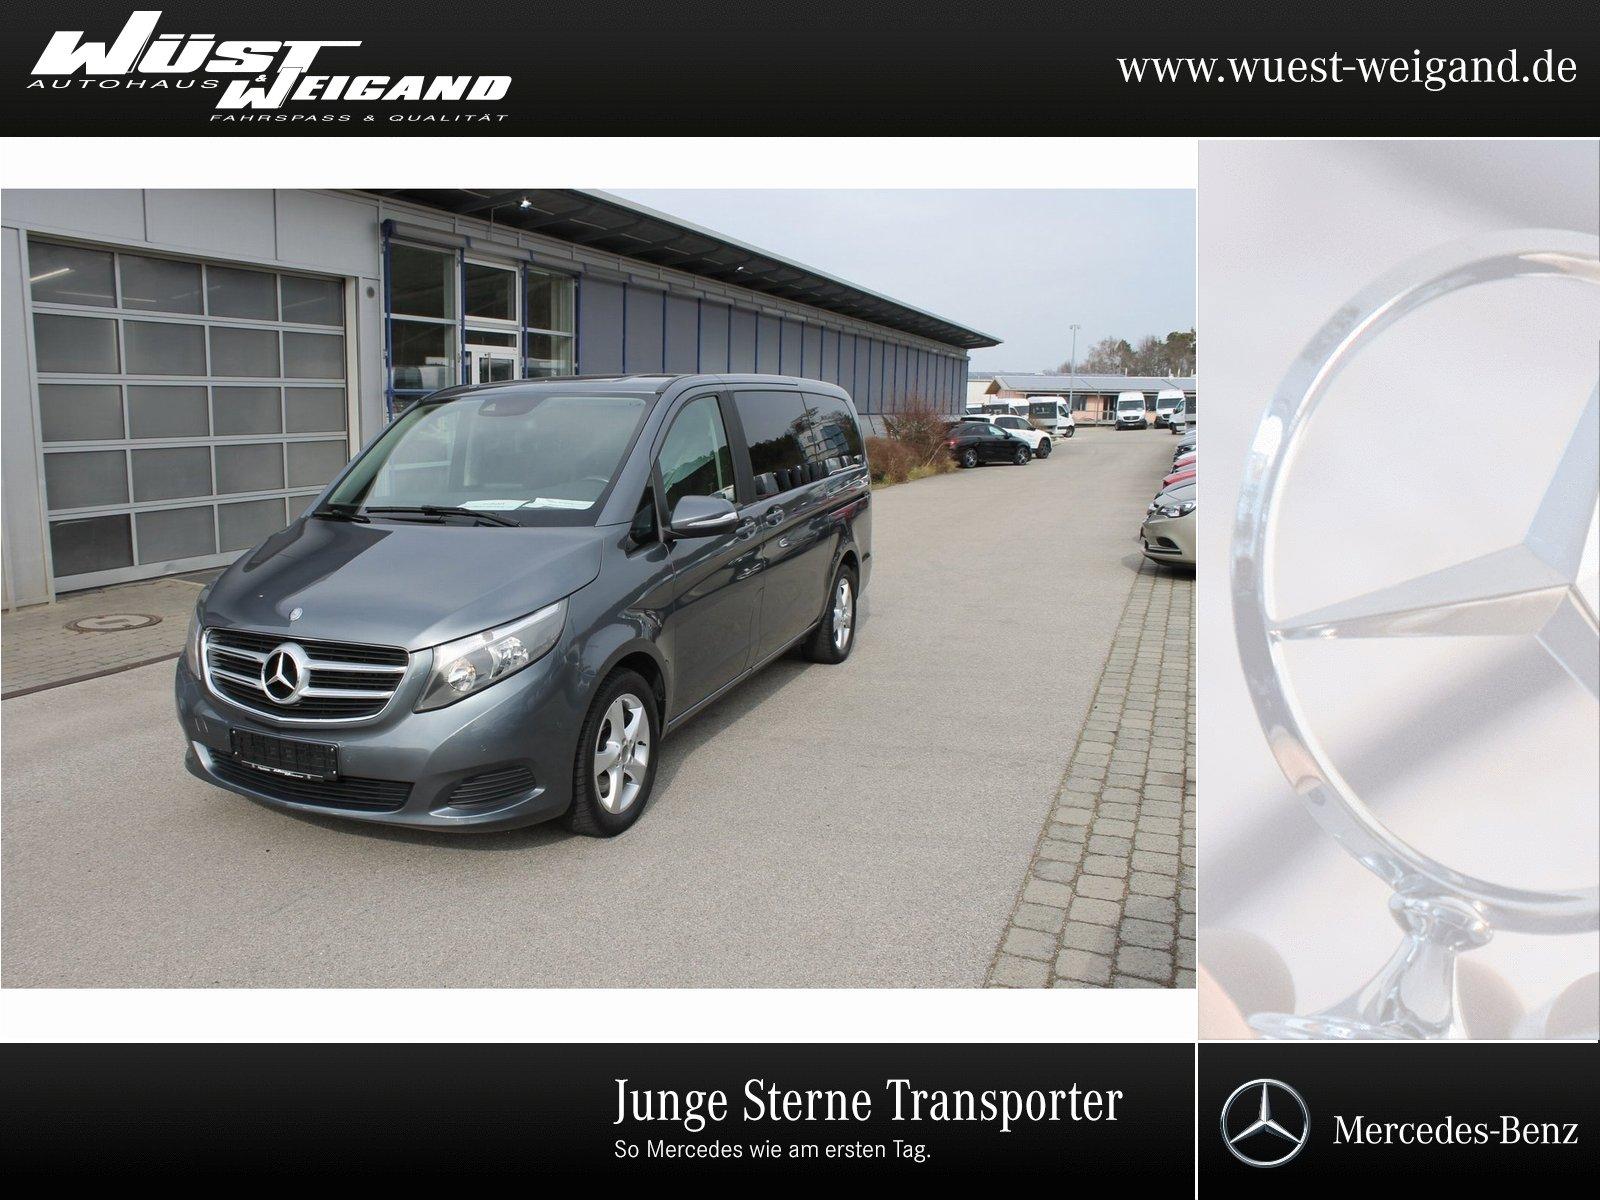 Mercedes-Benz V 220 CDI Edition lang Autom+Navi+PTS+Kamera+SHZ, Jahr 2014, Diesel